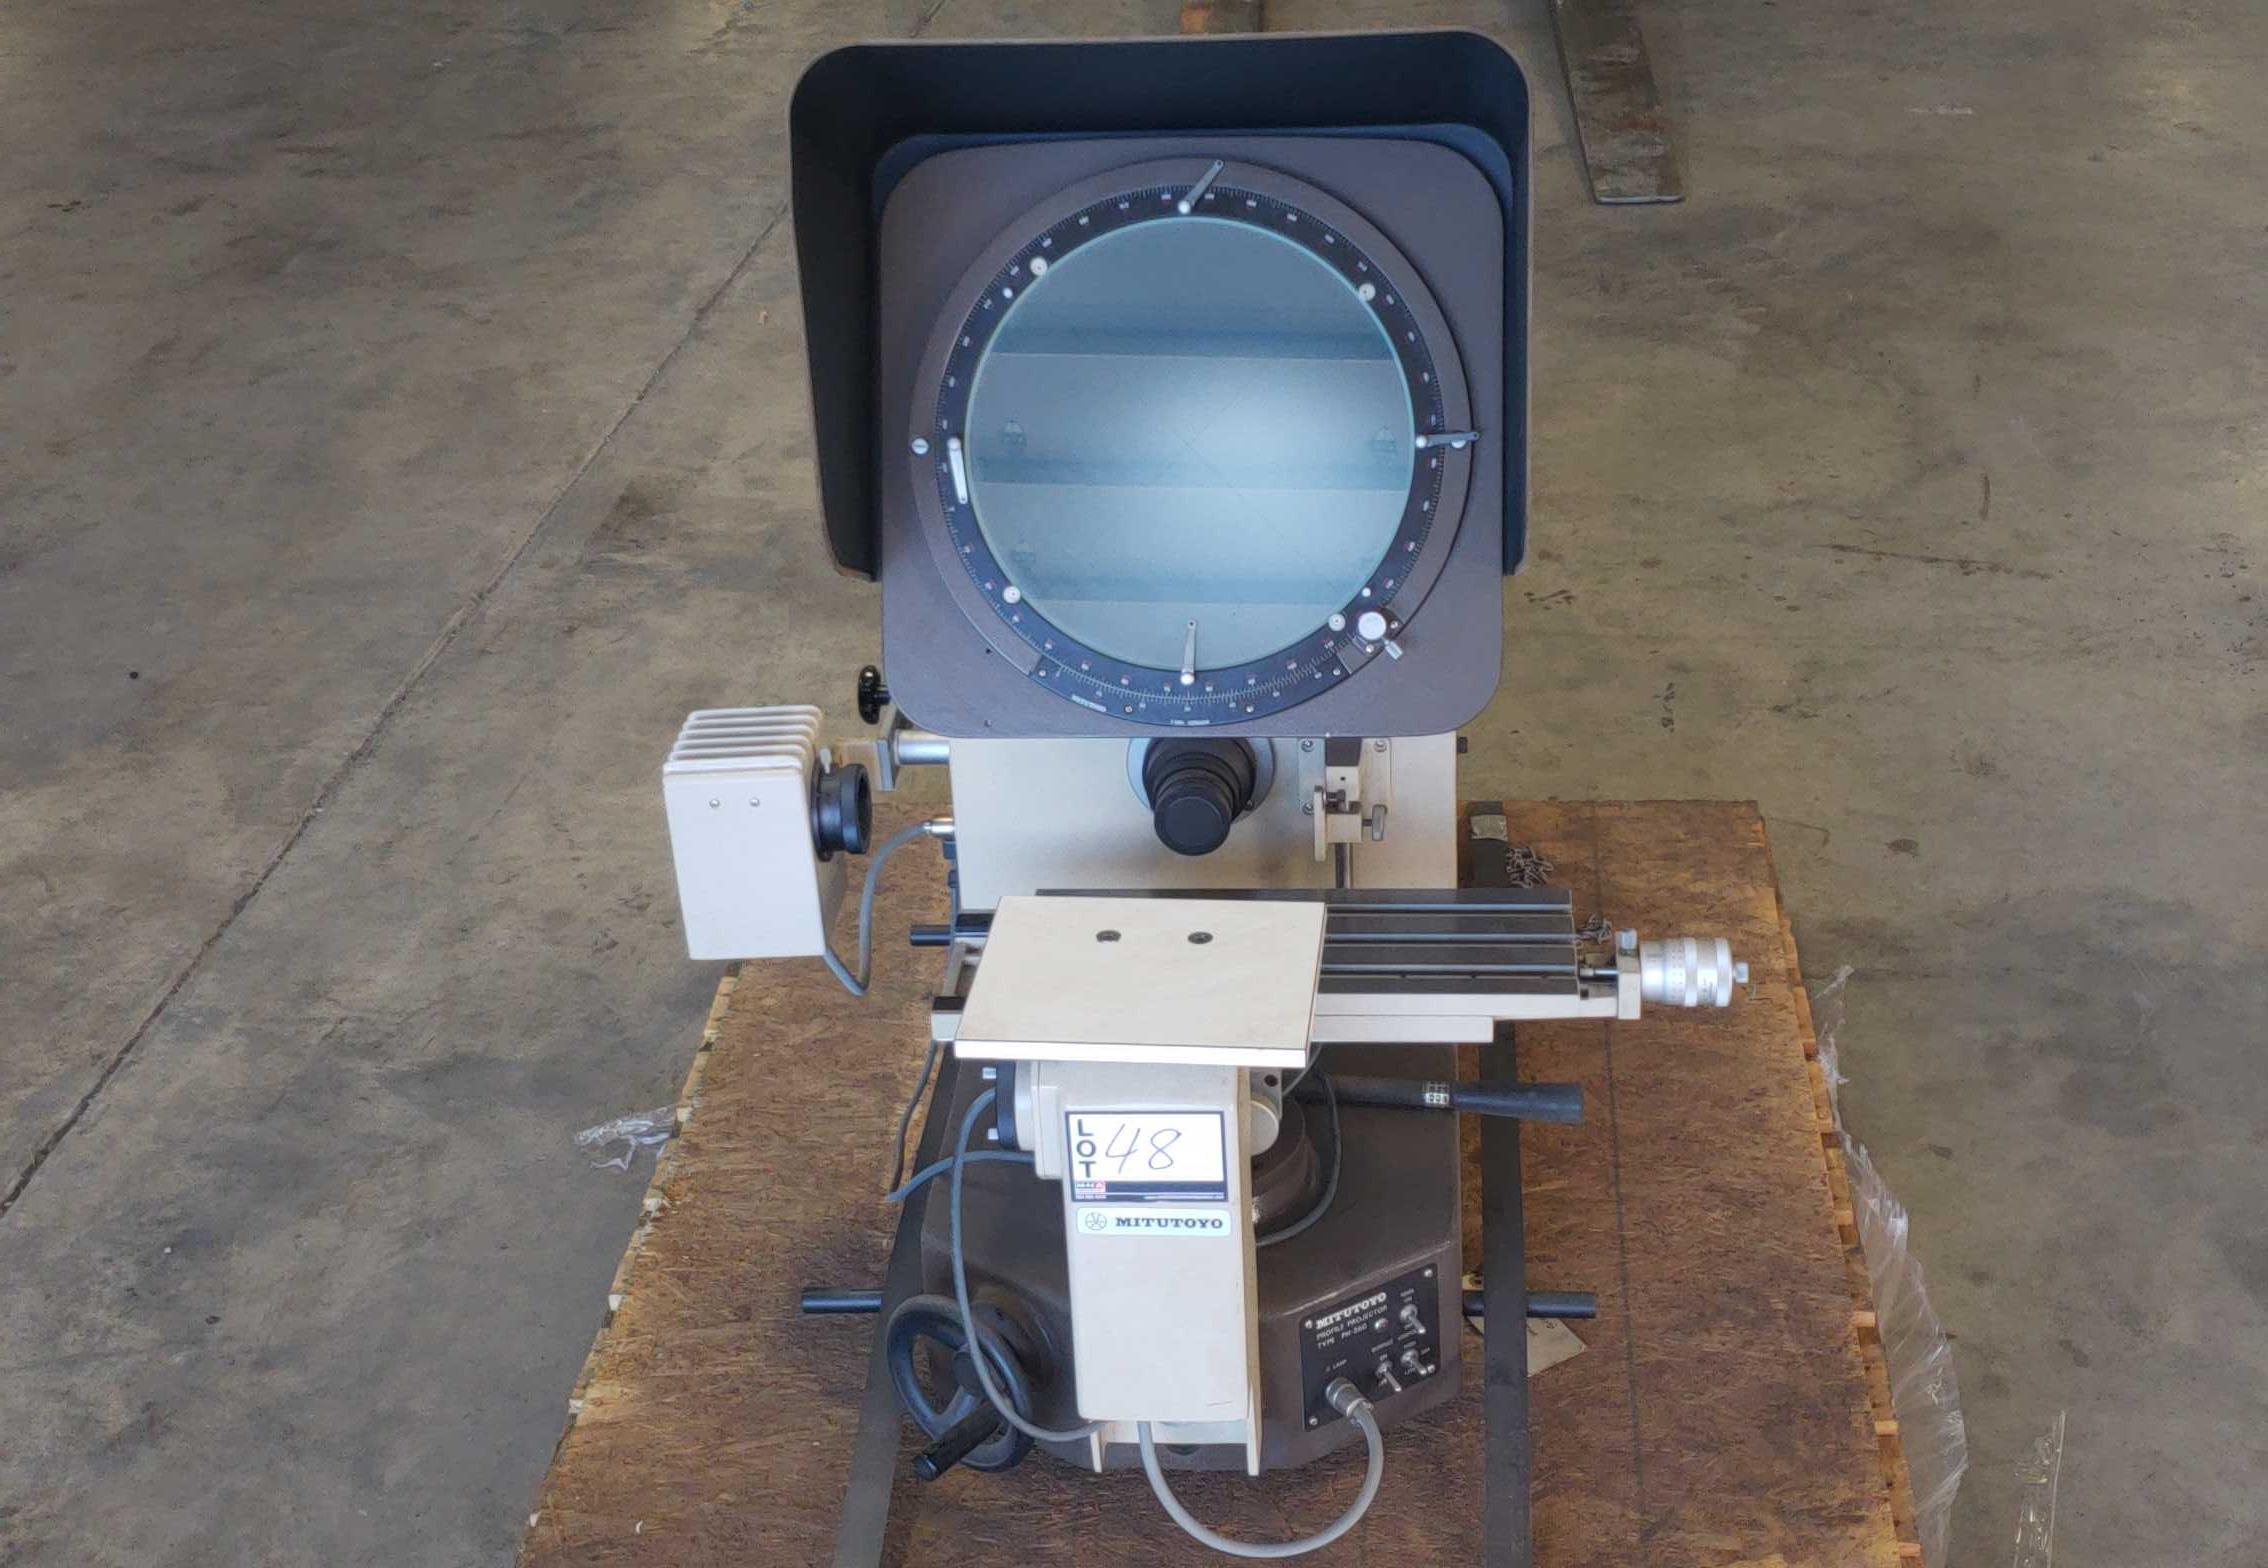 Mitutoyo PH-350 Optical Comparator SN: 40302 - Image 2 of 12